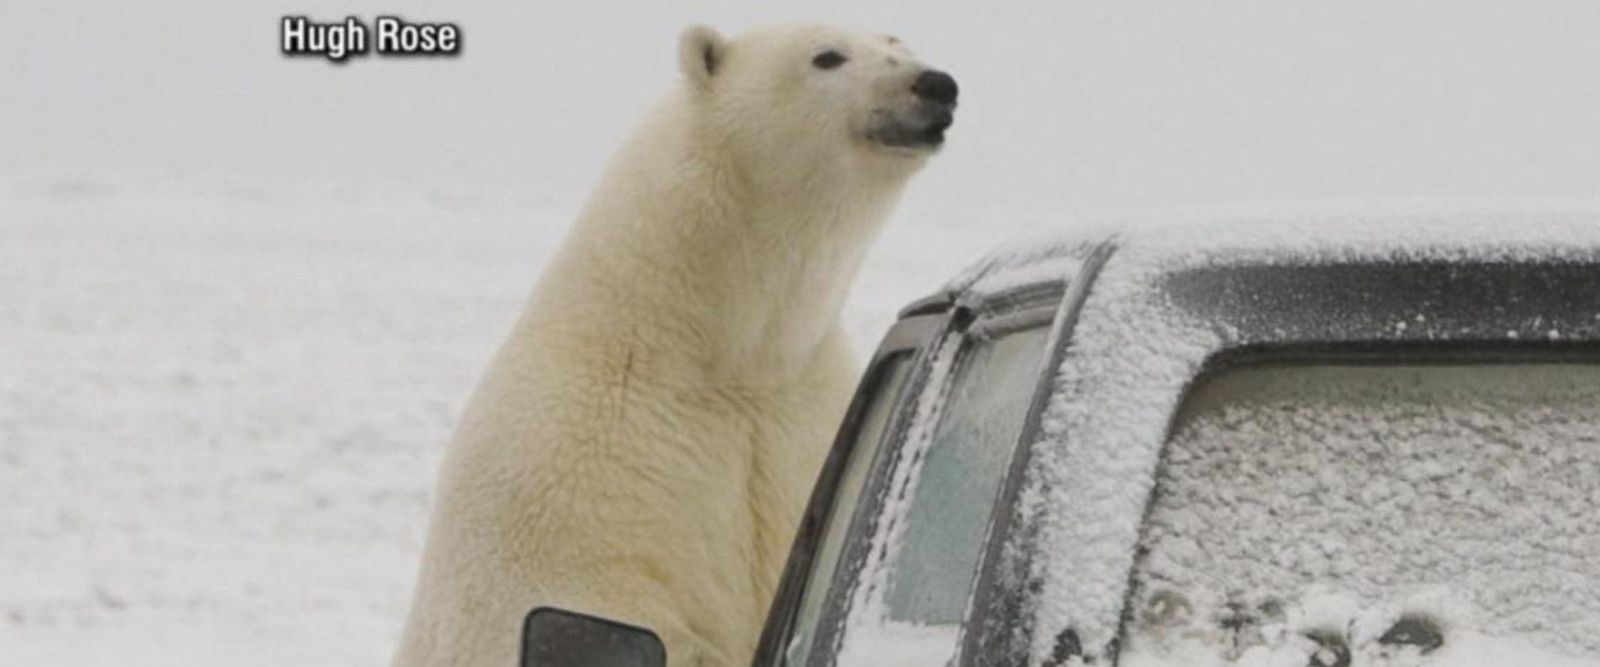 VIDEO: Polar bears descend on Alaskan village, causing tourist boom: Part 1